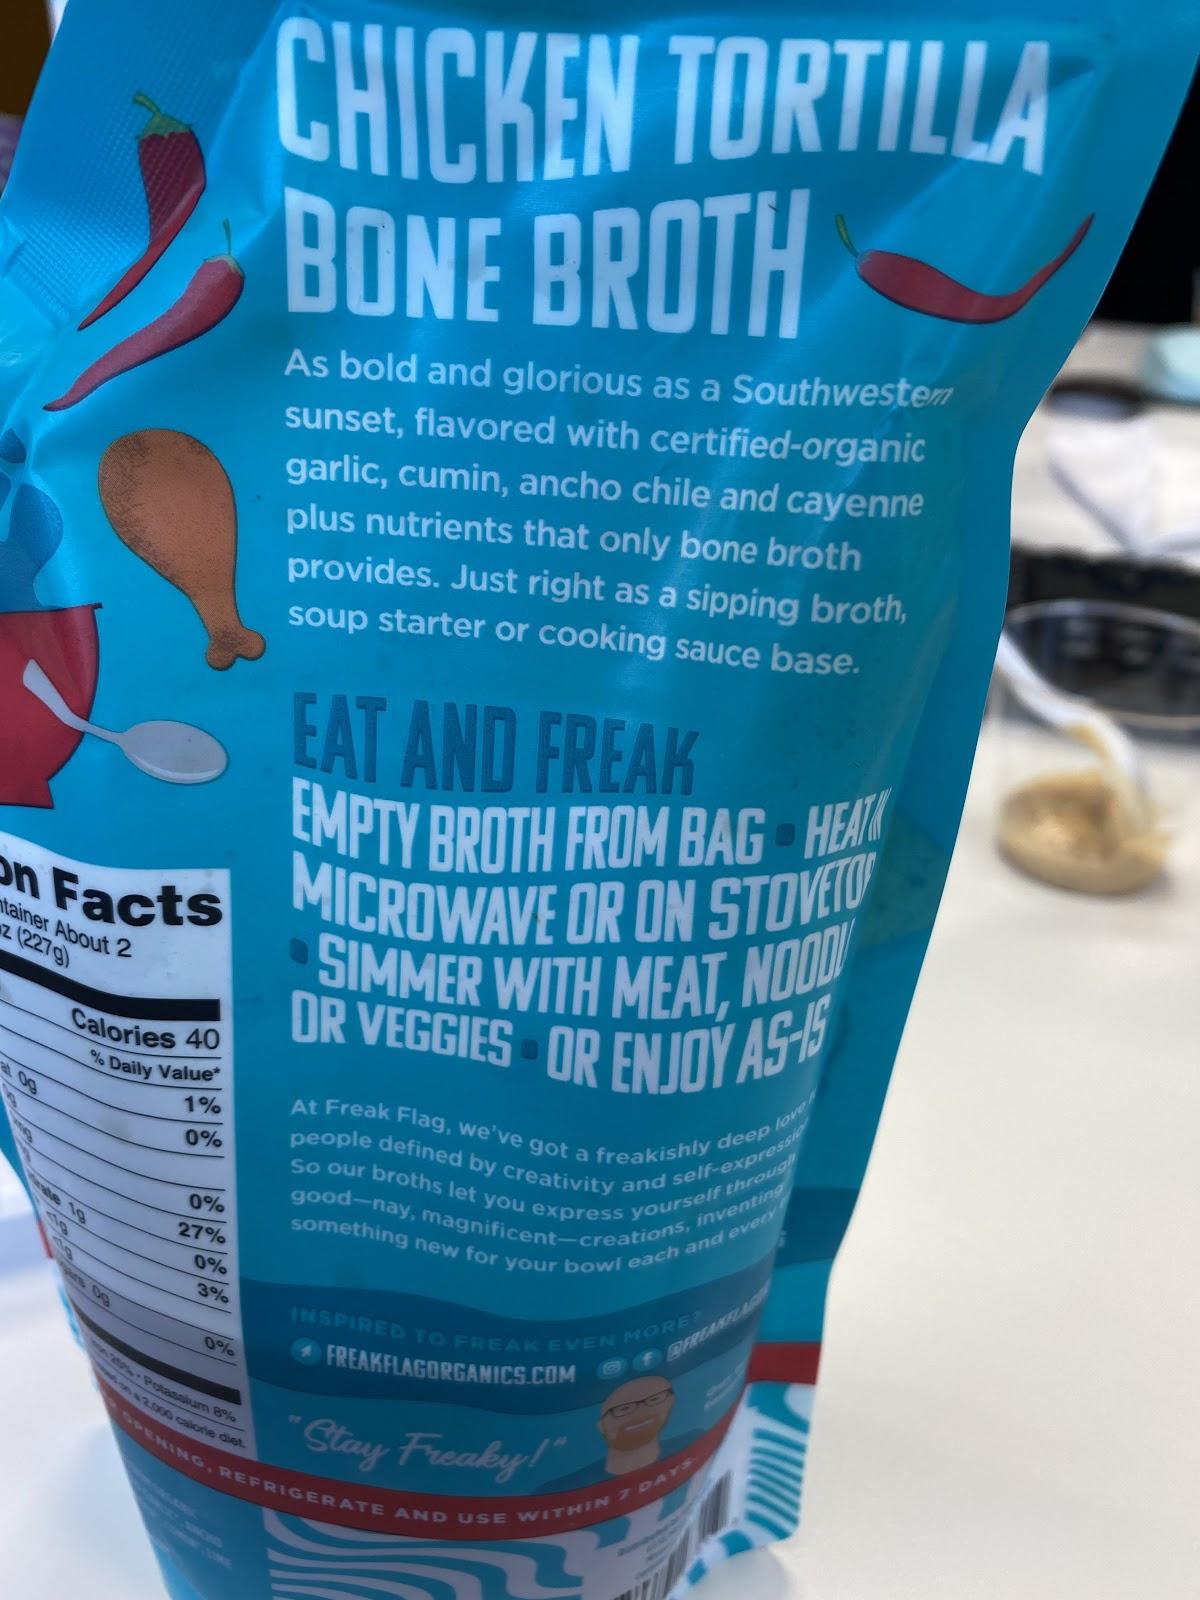 chicken tortilla bone broth bag